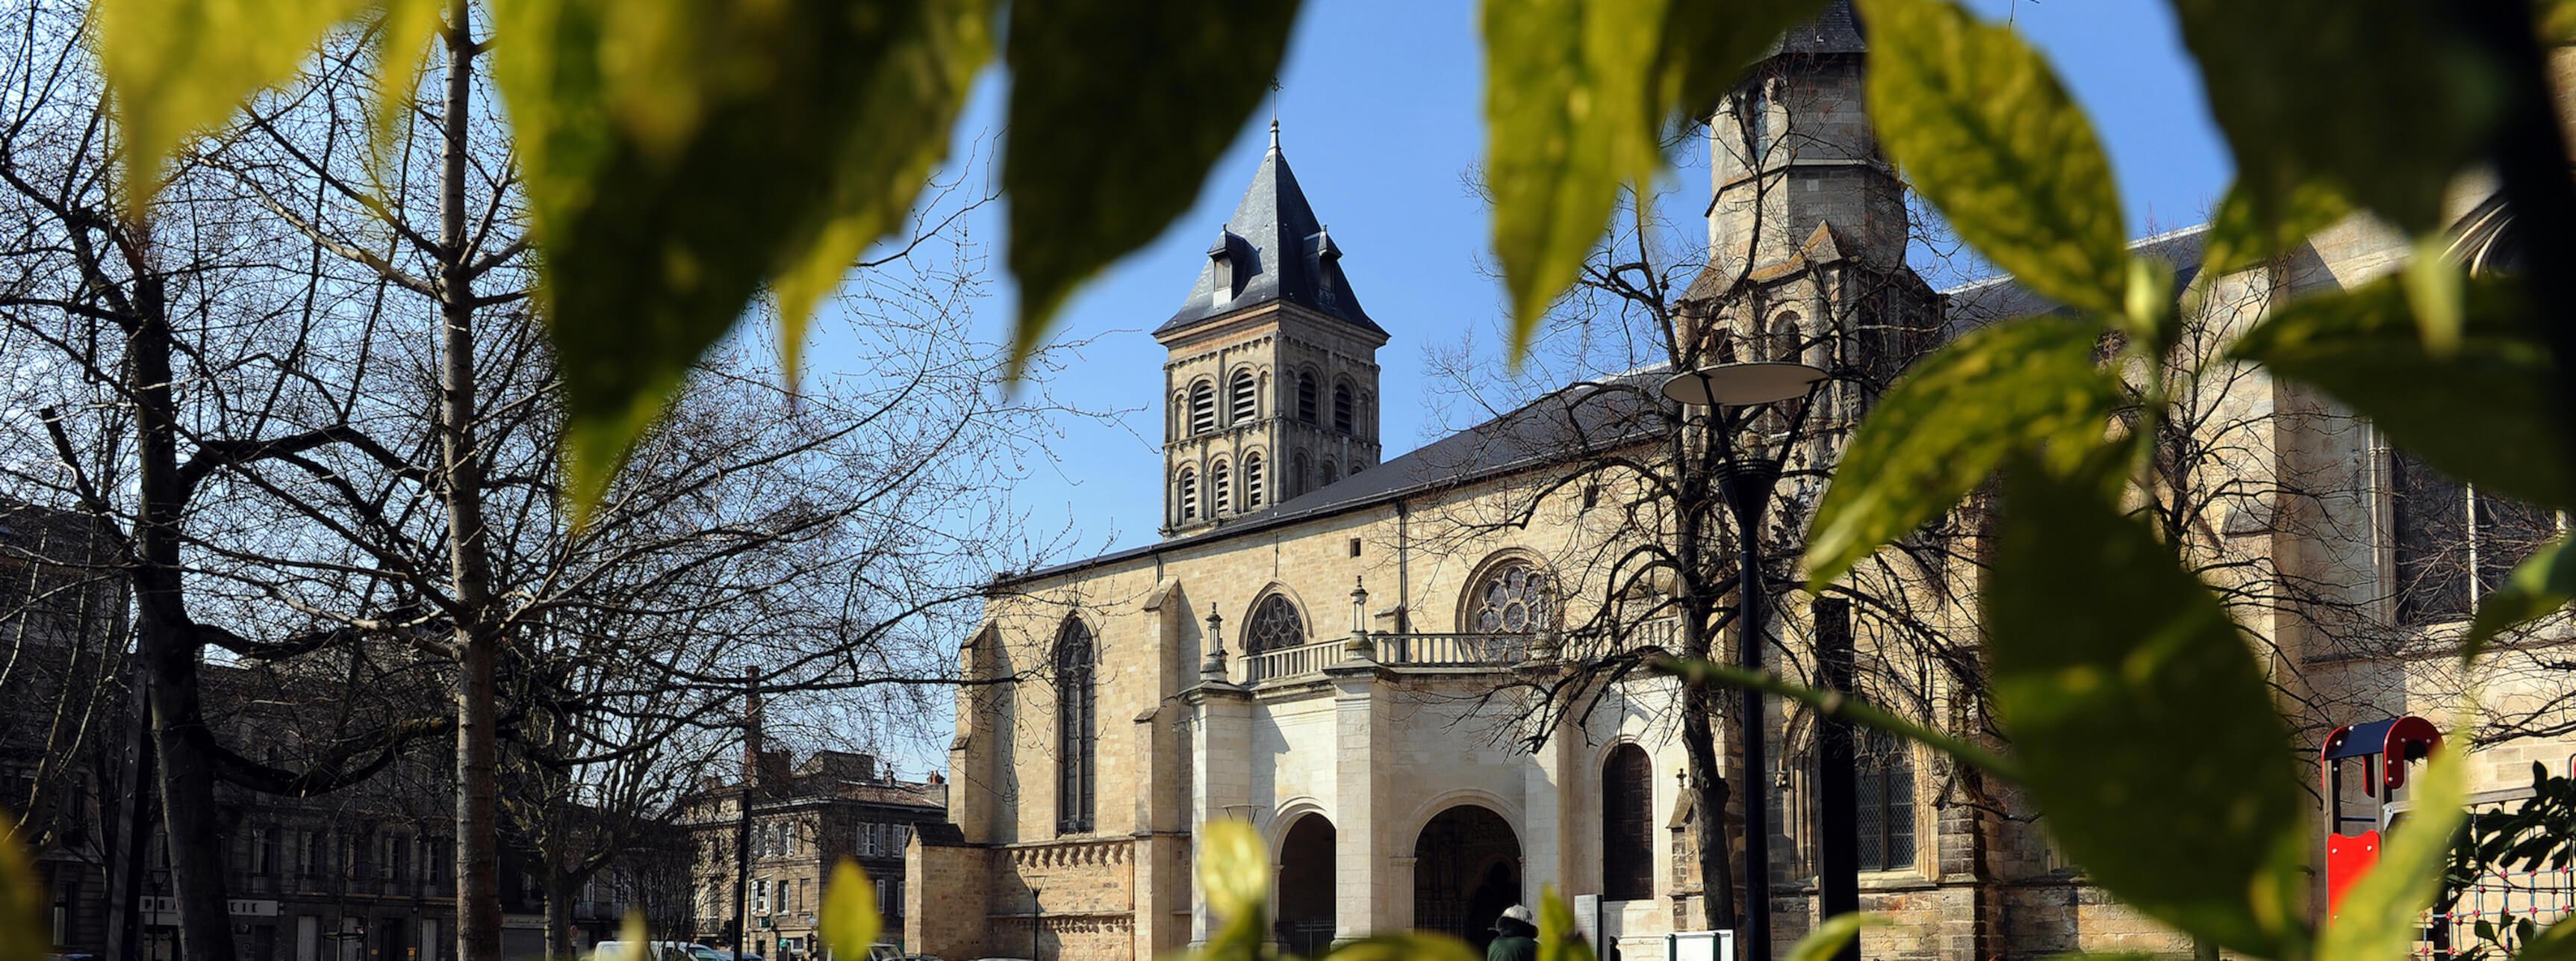 Basilique Saint-Seurin©ACIR / JJ Gelbart